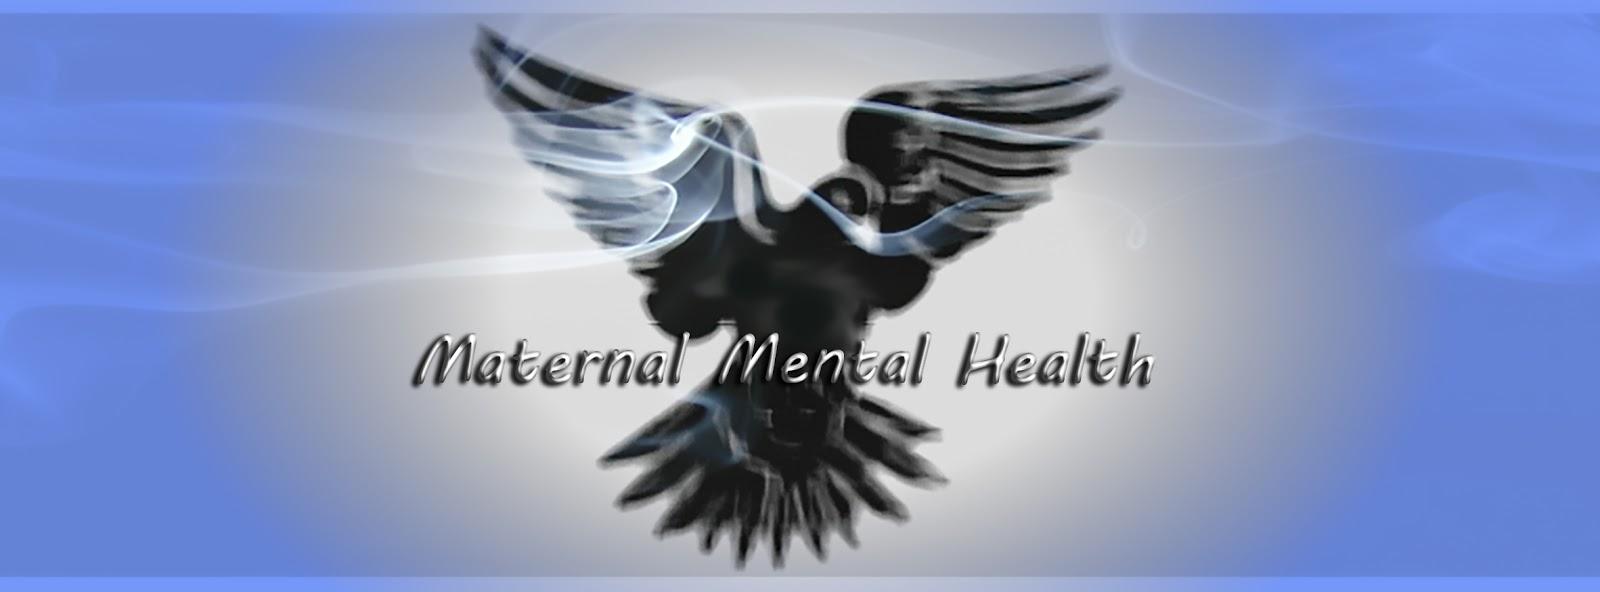 postpartum psychosis, natachia barlow ramsey, suicide, depression, mental health awareness